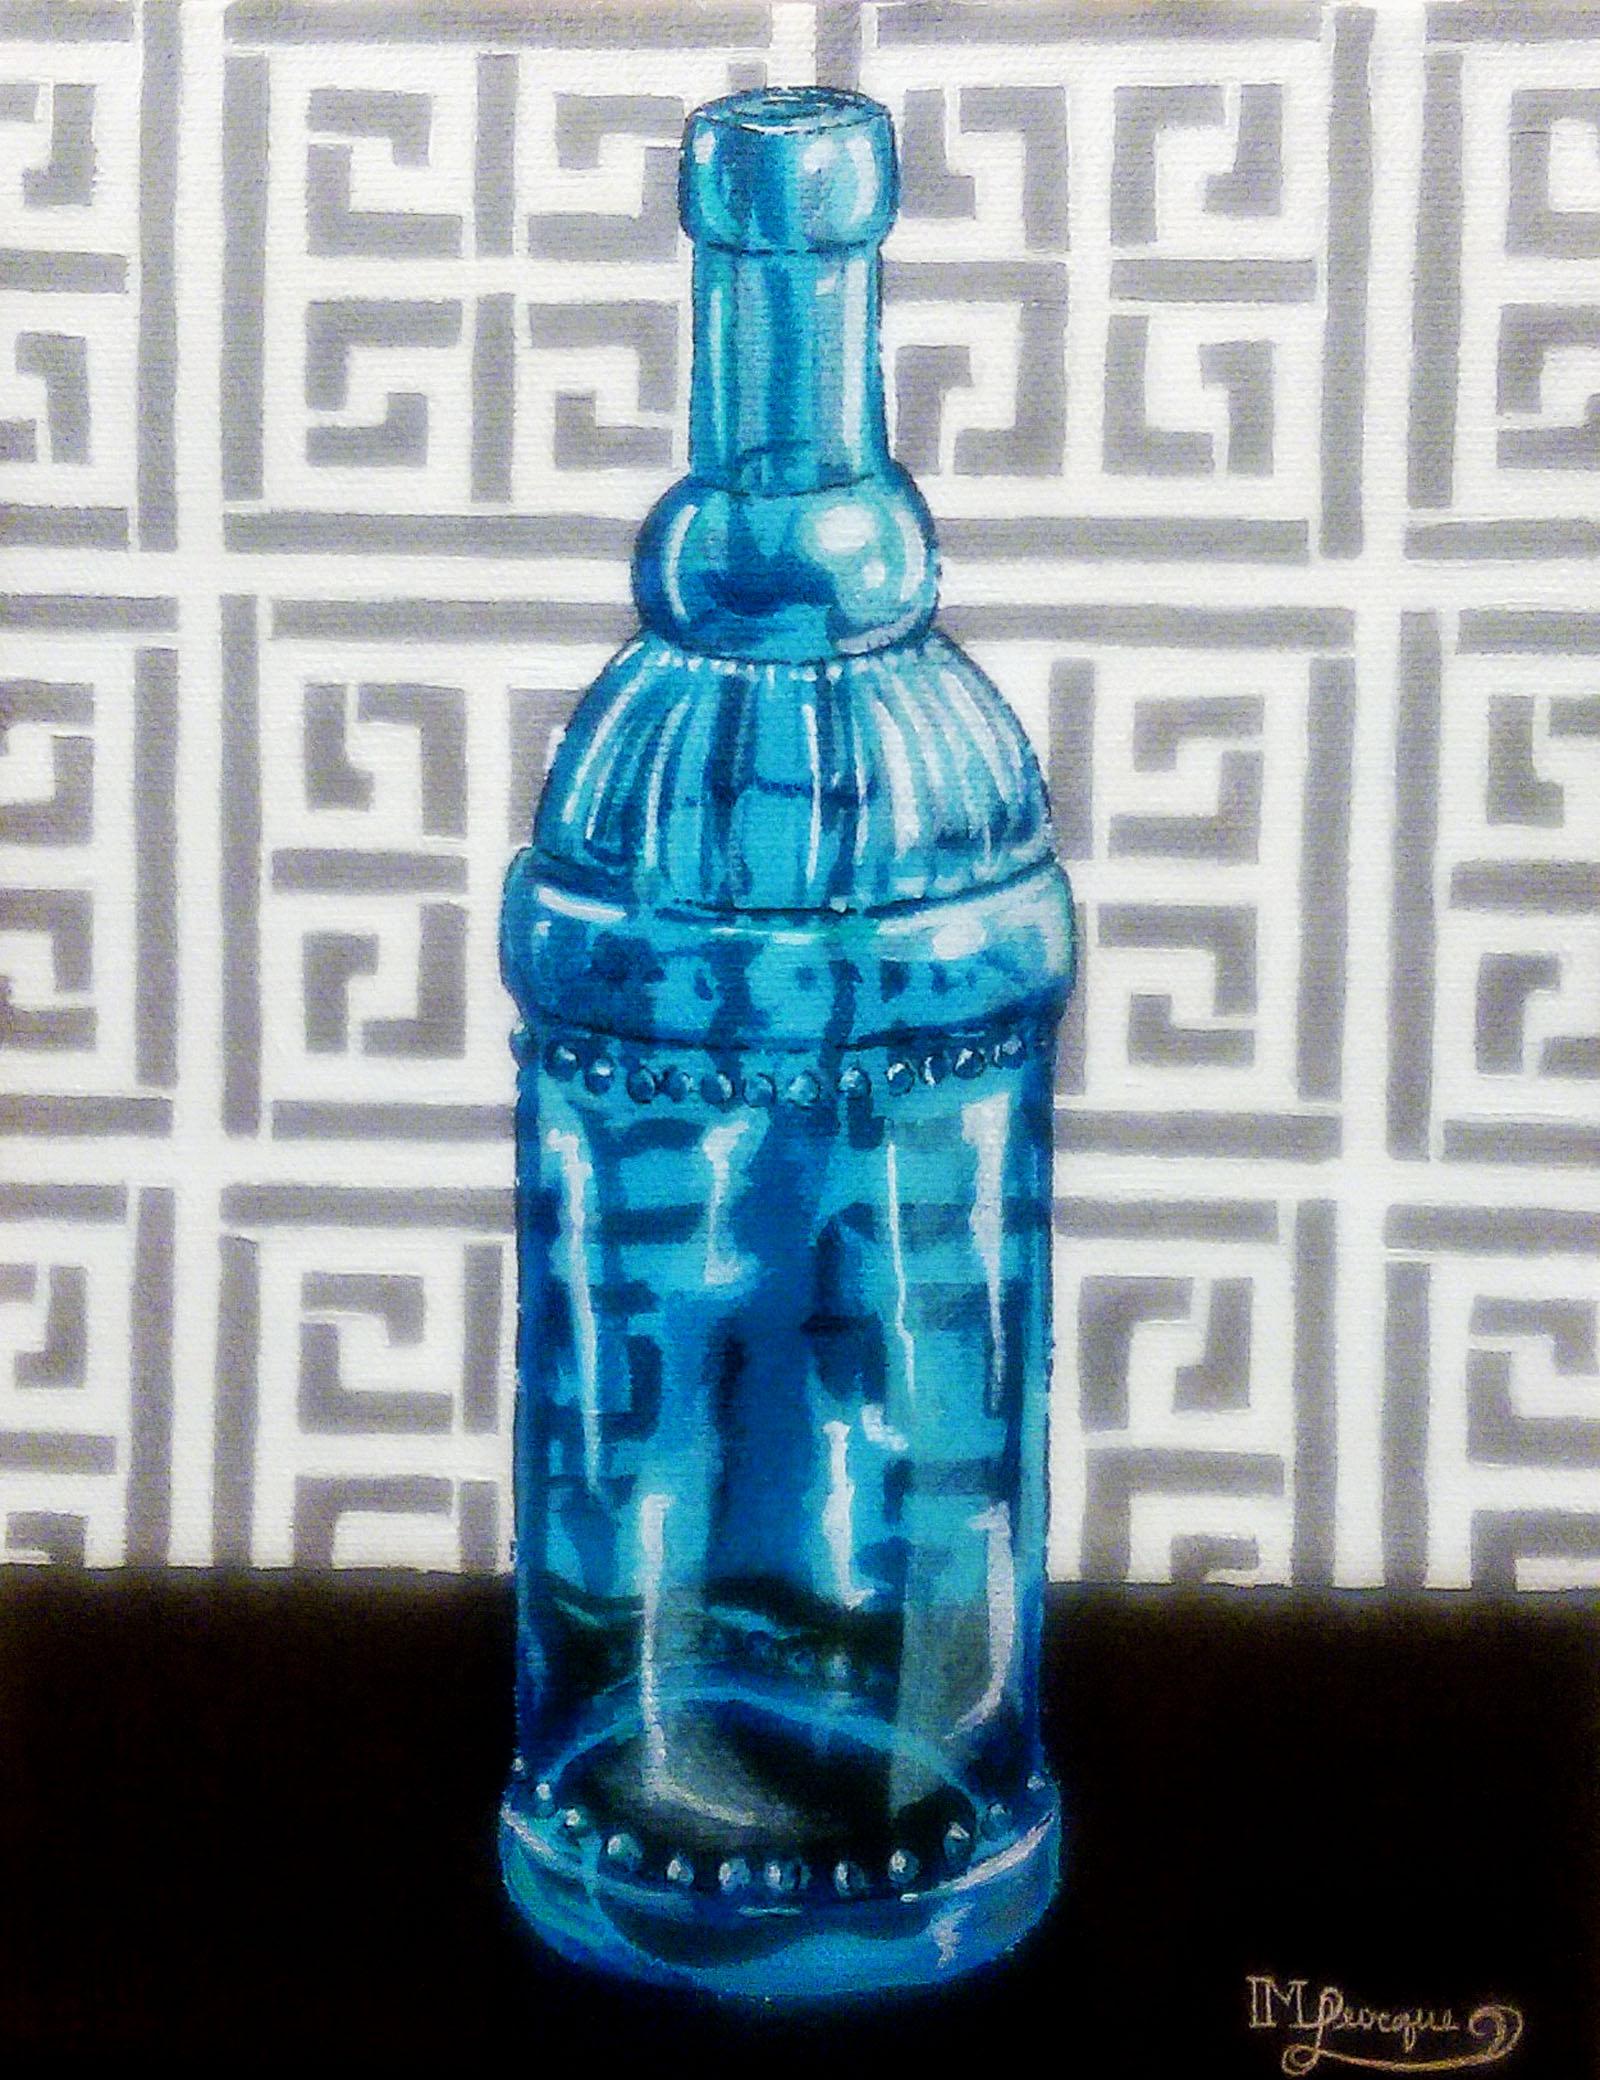 Bottle Study 3